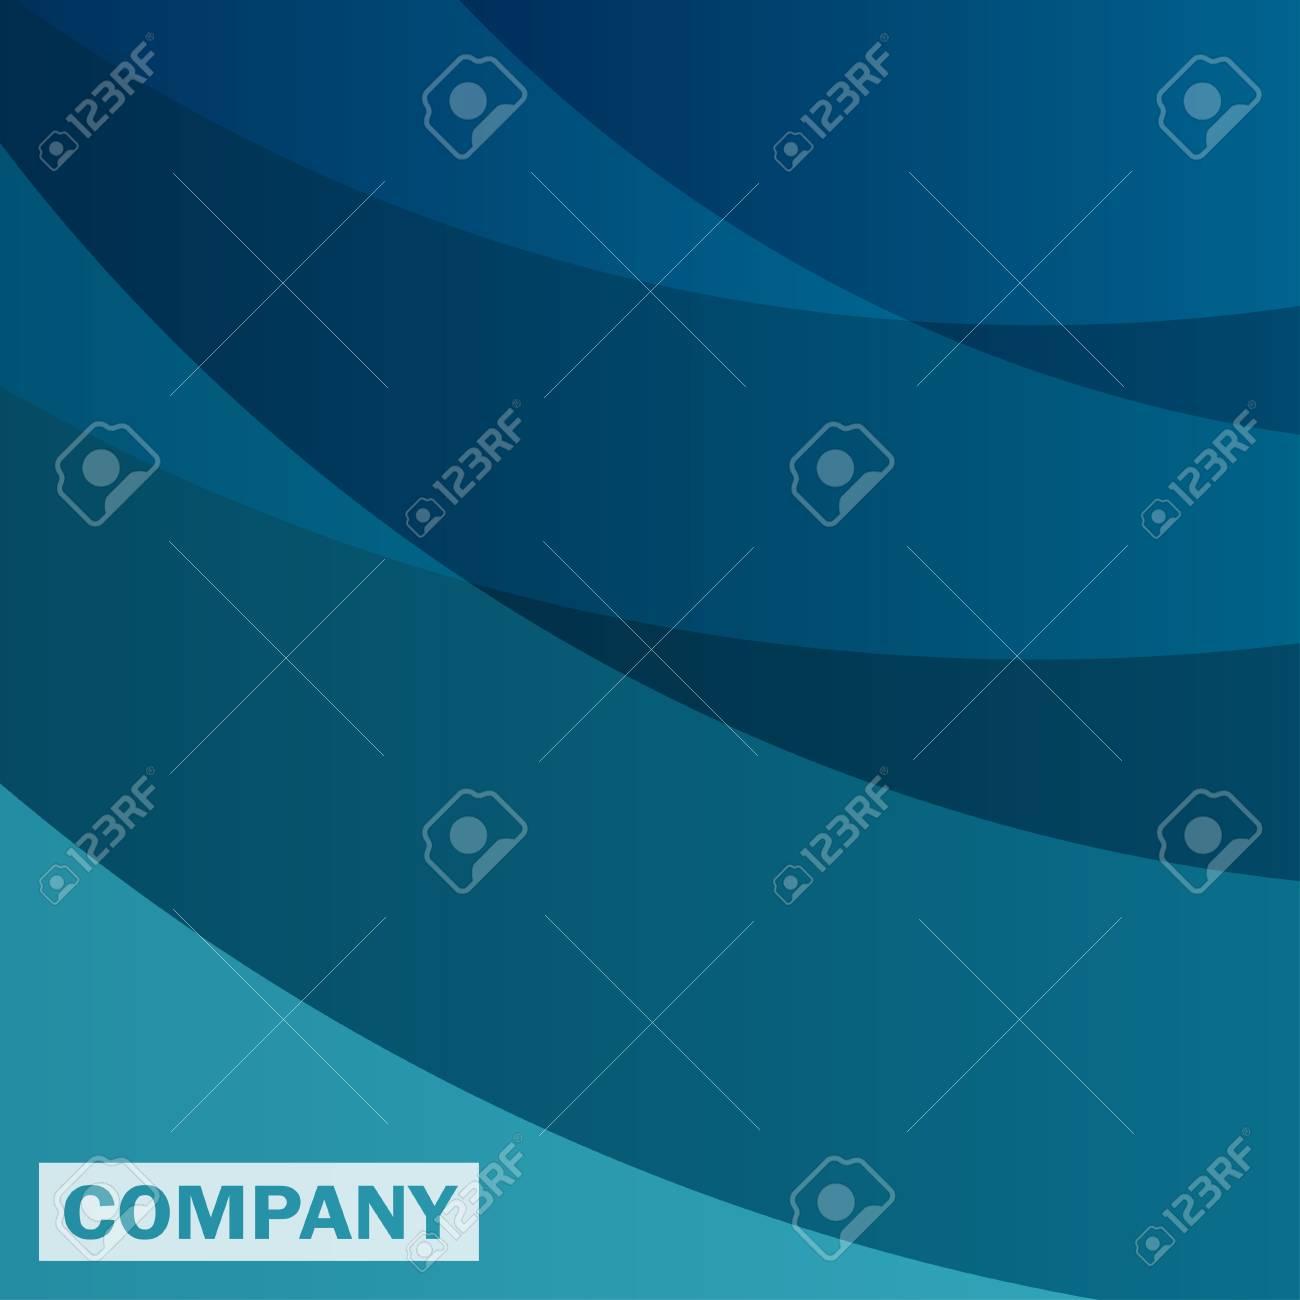 Design Background Vector - 51768755